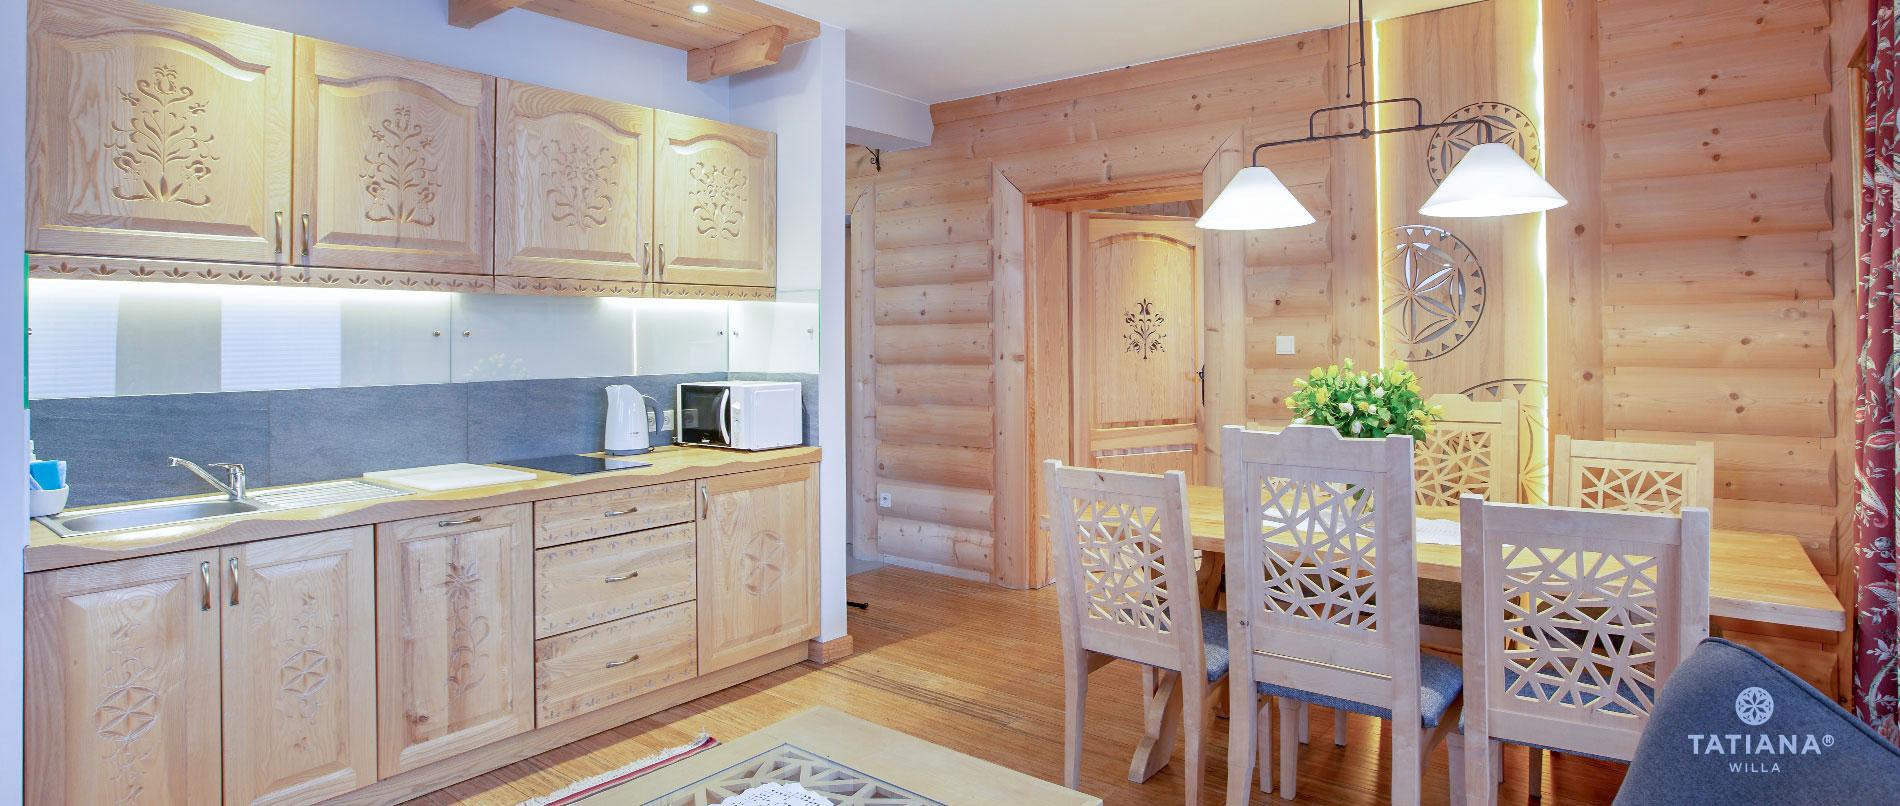 Apartament Lux 17- aneks kuchenny